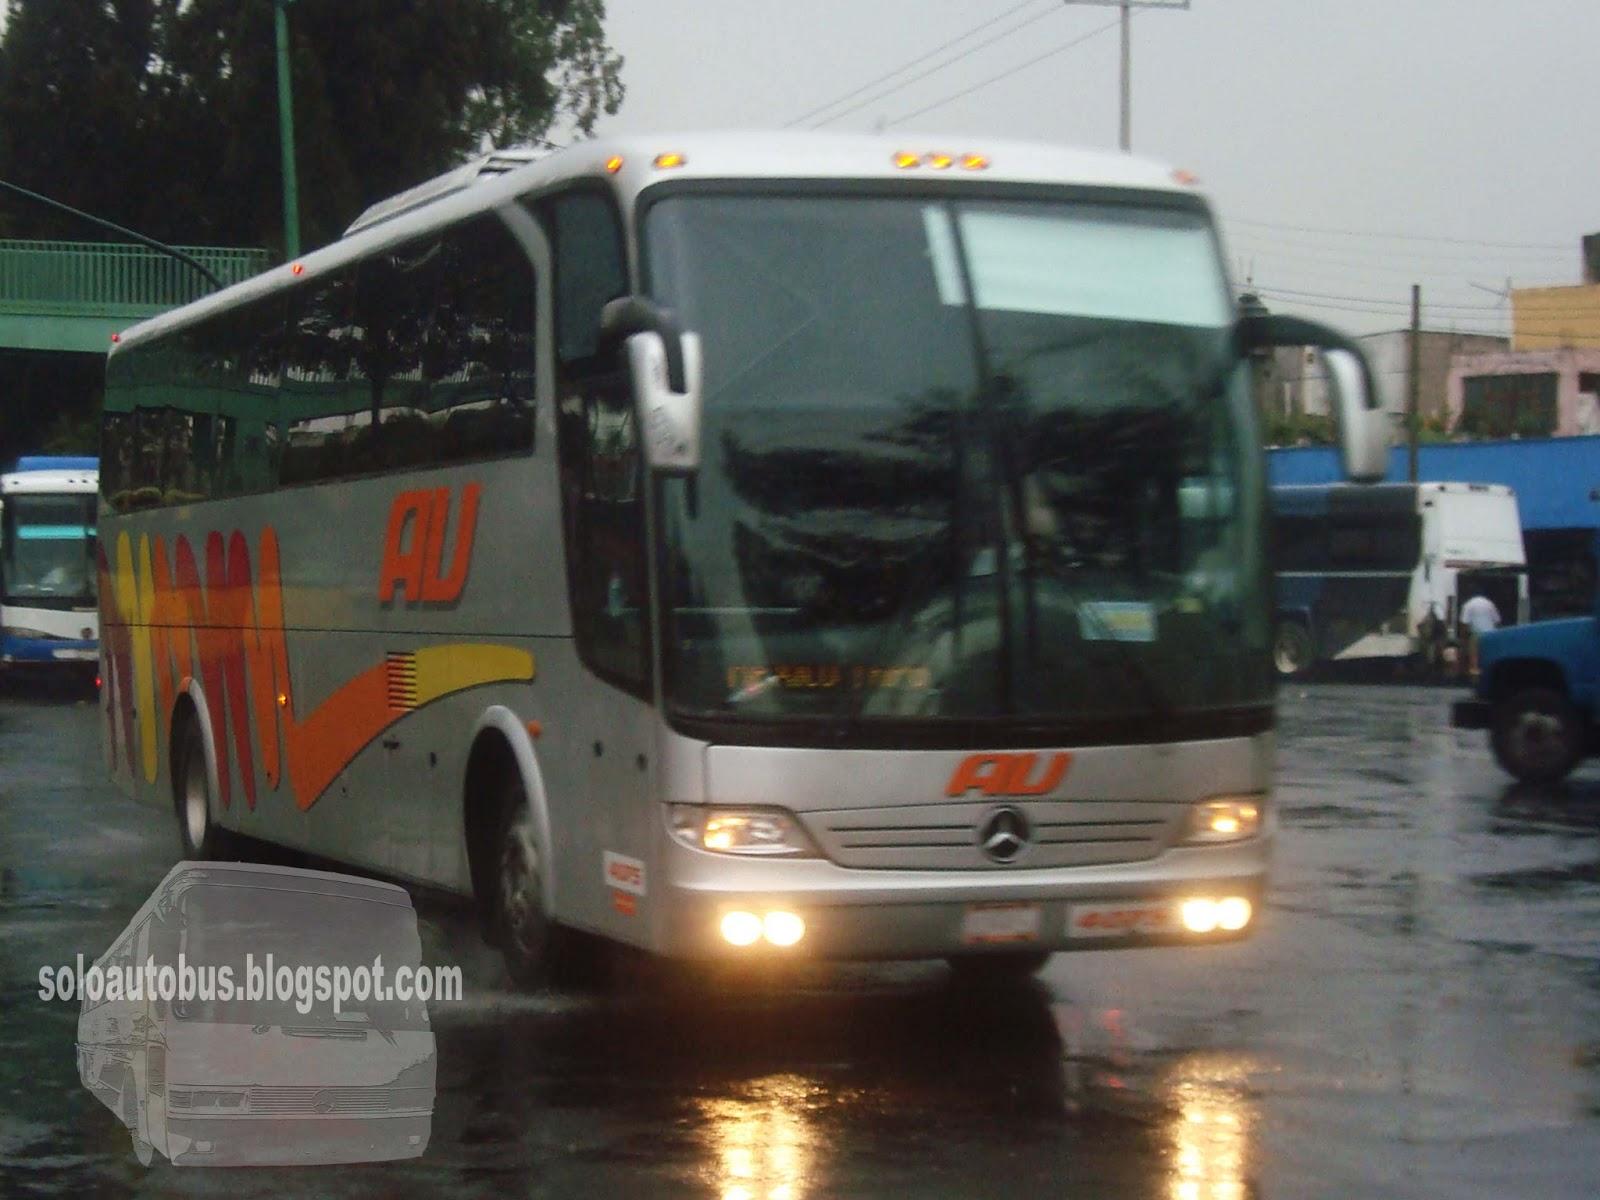 Soloautobus: Autobuses Unidos AU